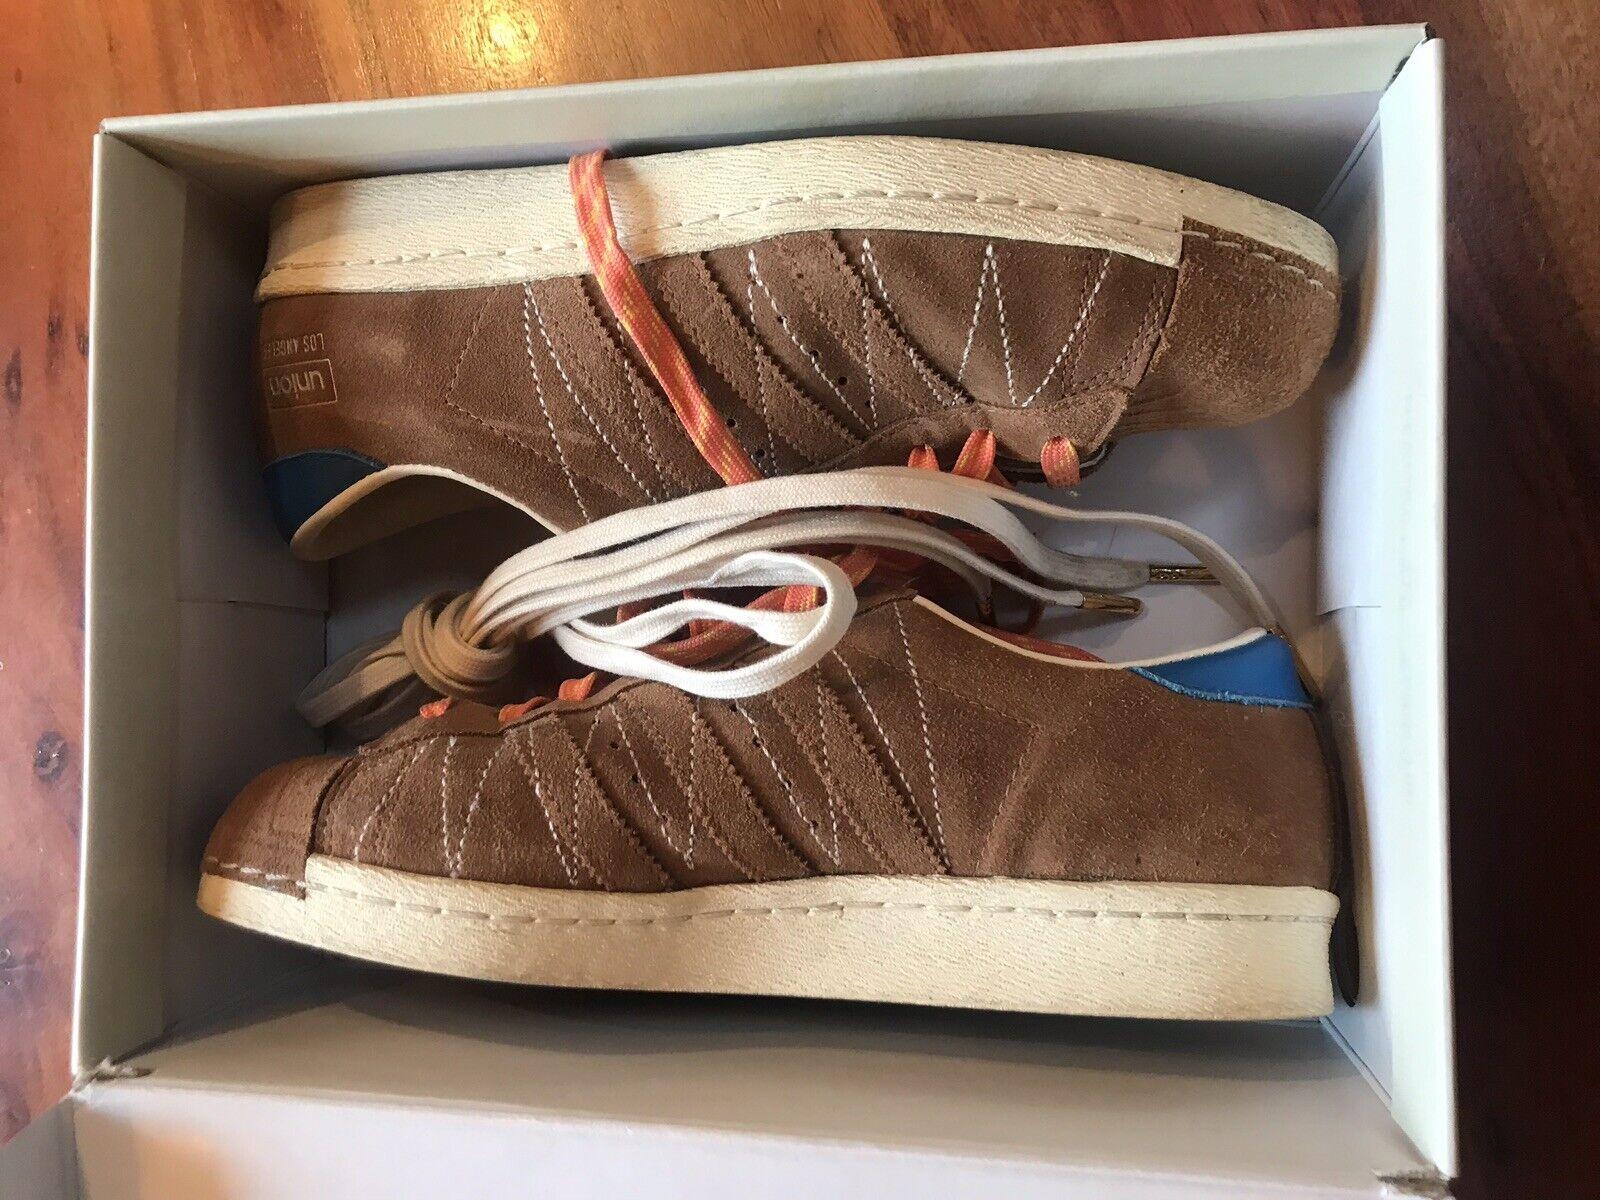 Adidas Superstar 80v UNION LA shoes